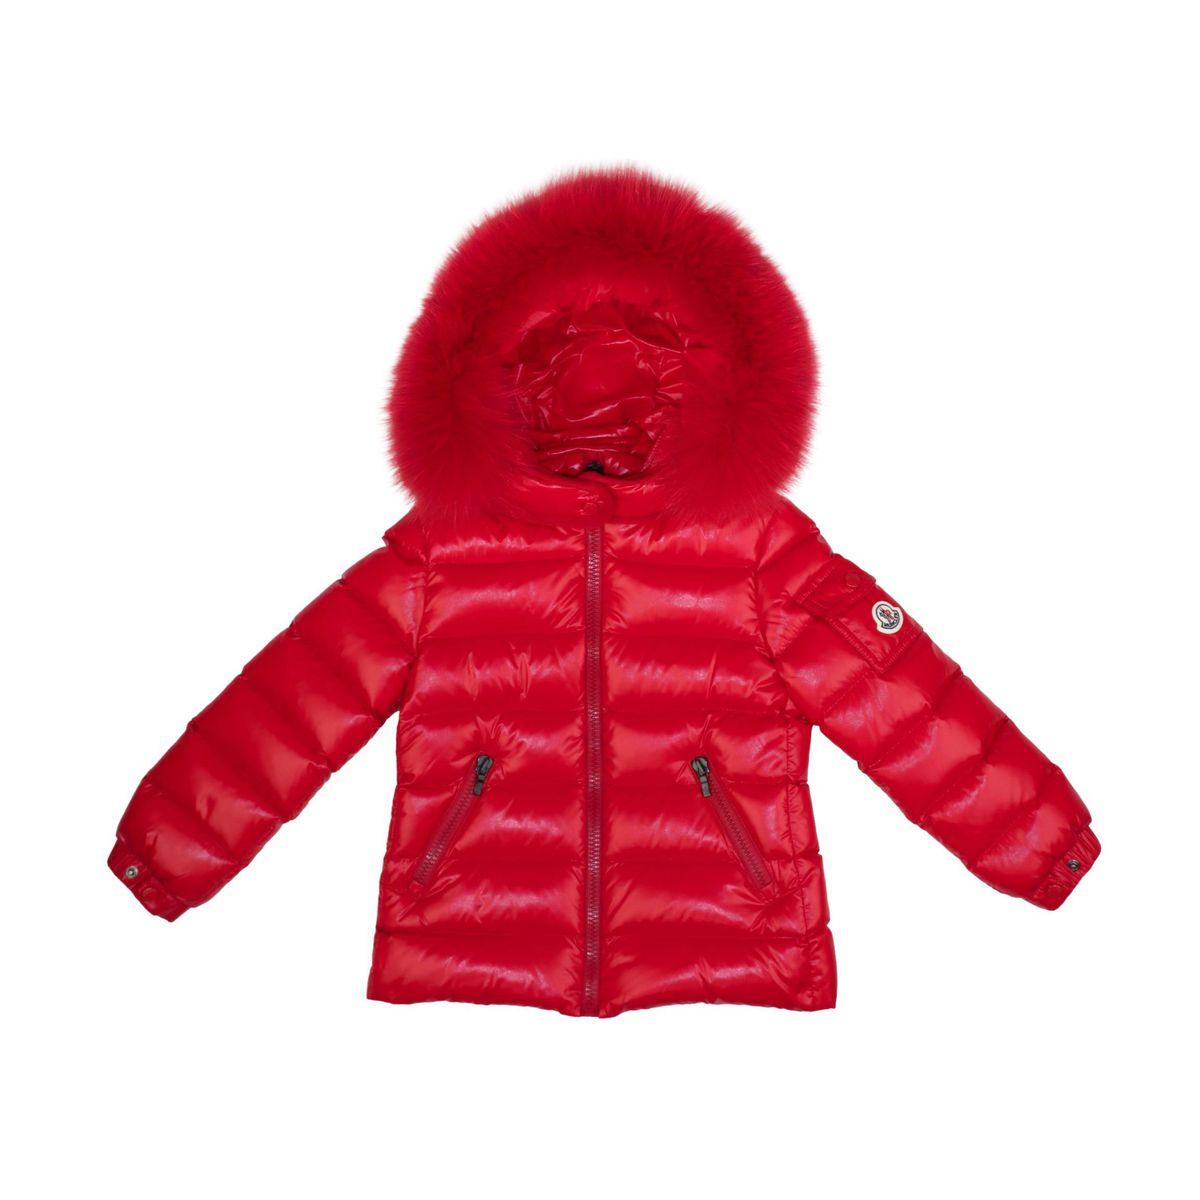 1. Moncler Bady Fur down jacket with fur trim Red Moncler